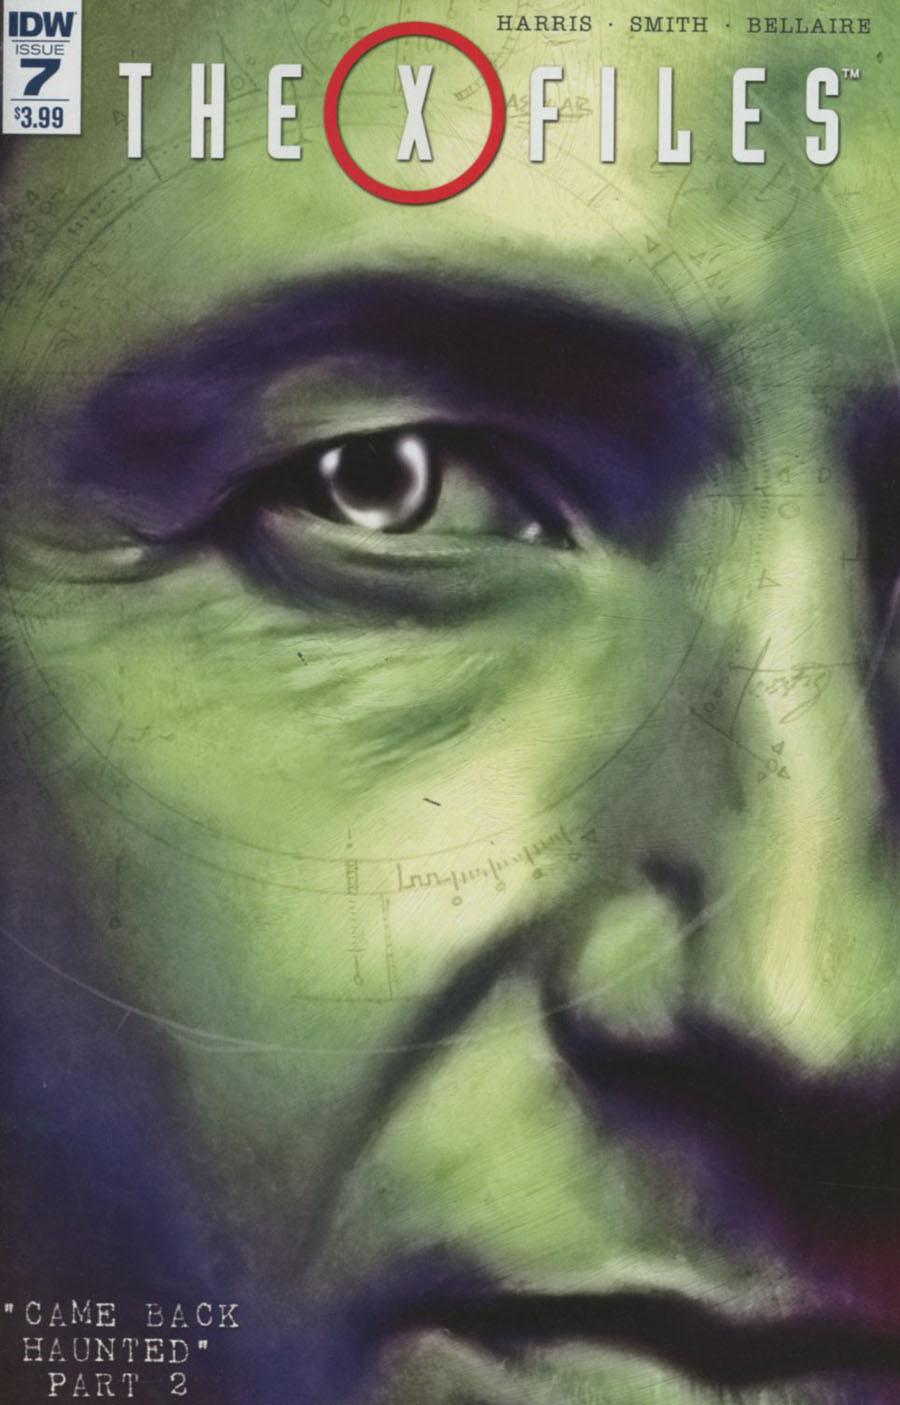 X-Files Vol 3 #7 Cover A Regular Menton3 Cover